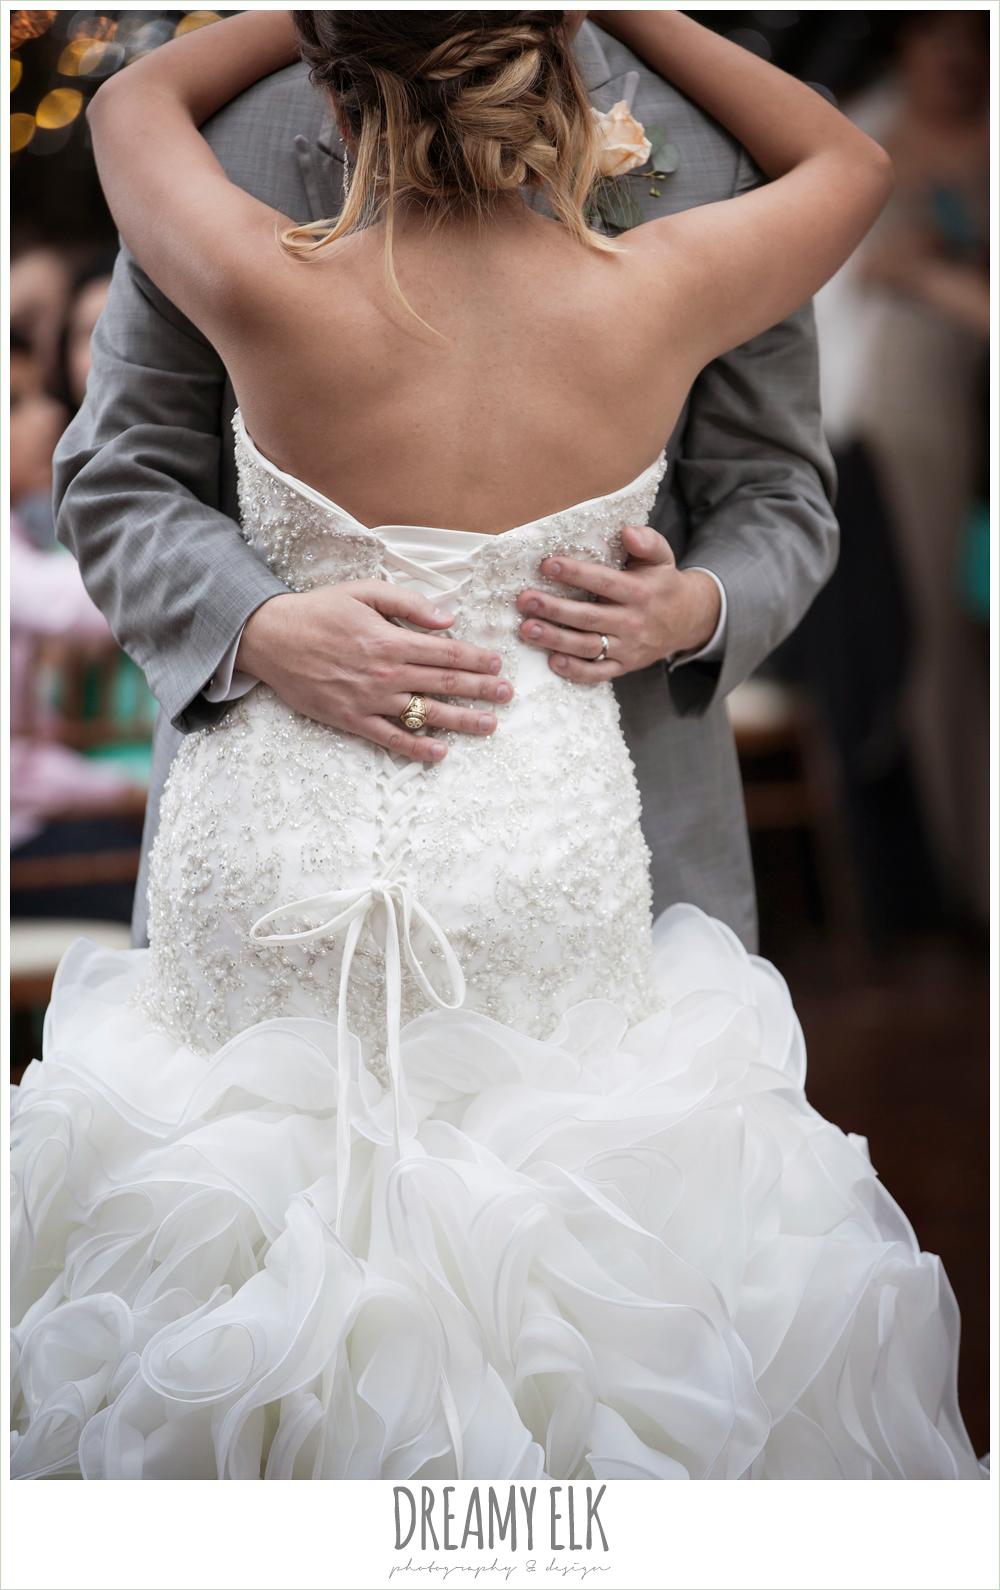 bride and groom's first dance, strapless beaded ruffle skirt wedding dress, terradorna wedding venue, austin spring wedding {dreamy elk photography and design}